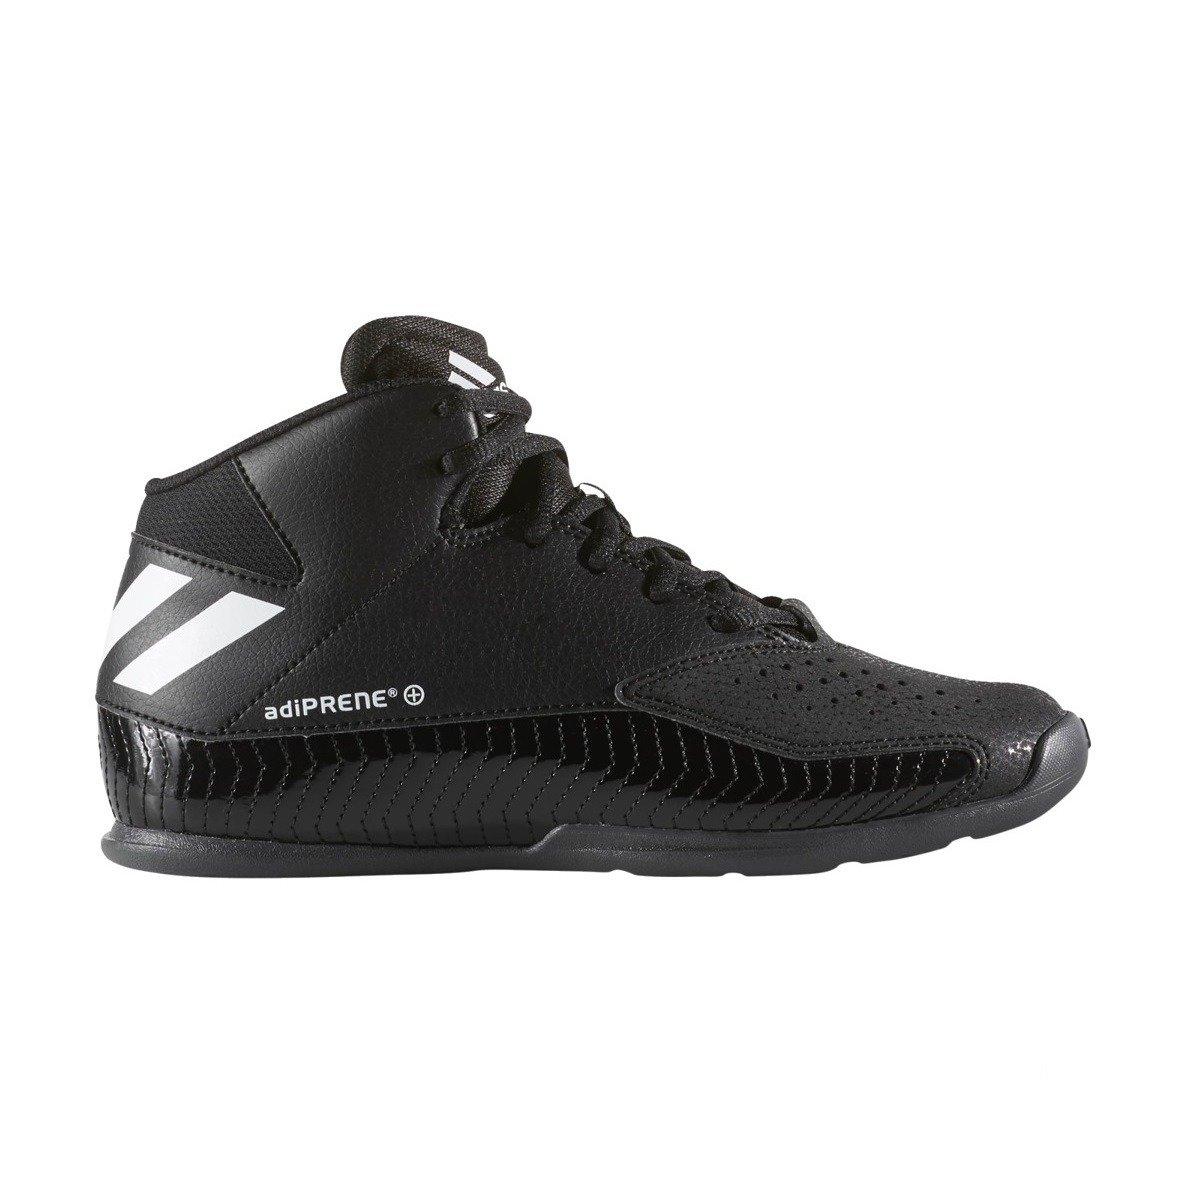 8ef99df1f9d9e Buty Adidas Next Level Speed 5 - BW0499 - Basketo.pl